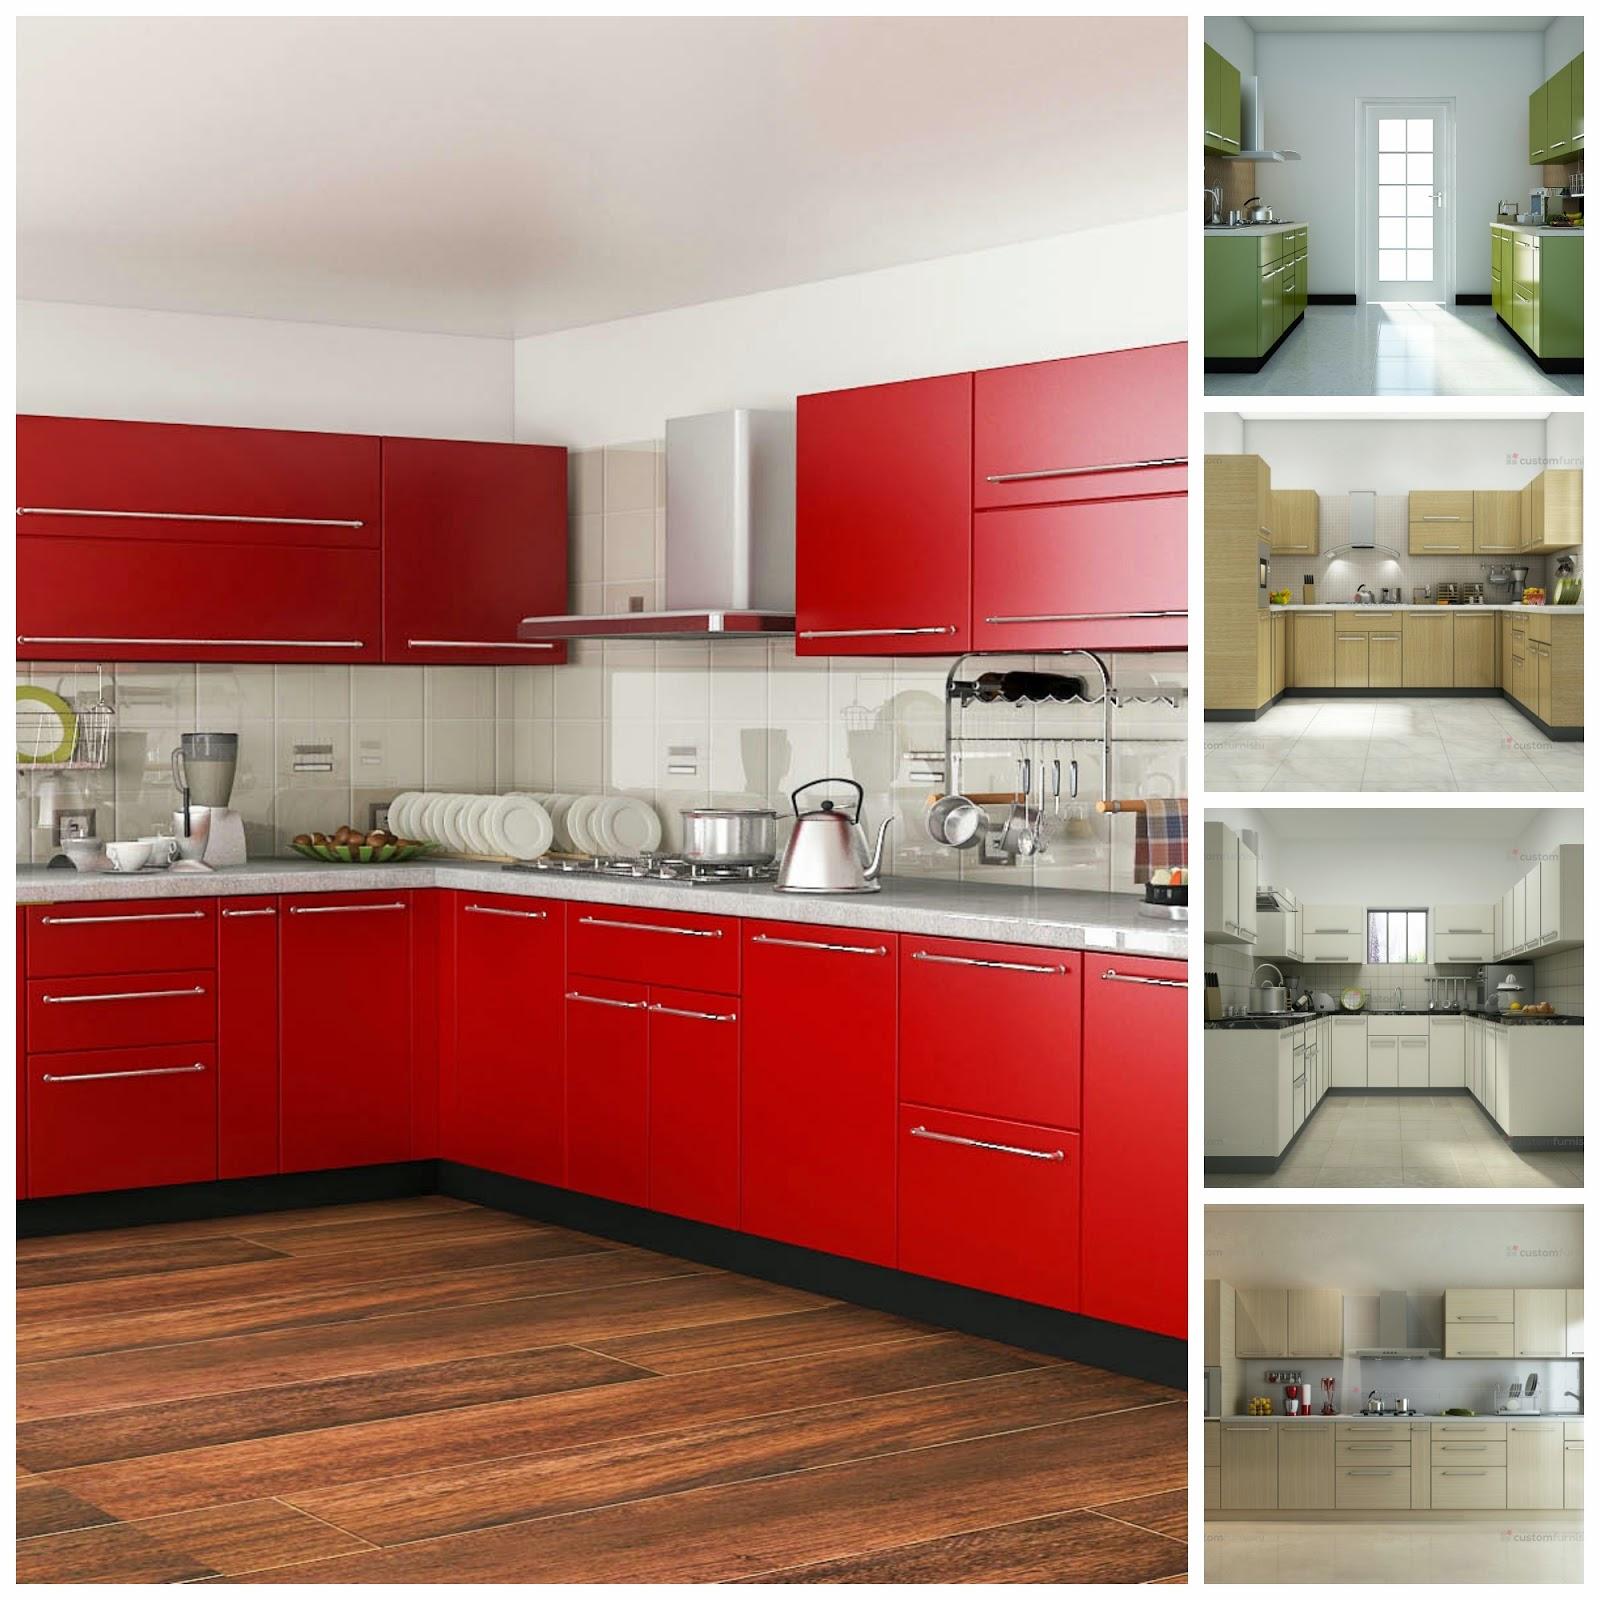 modular kitchens buying guide interior decor customfurnish kitchen interiors modular kitchens chennai chennai interior